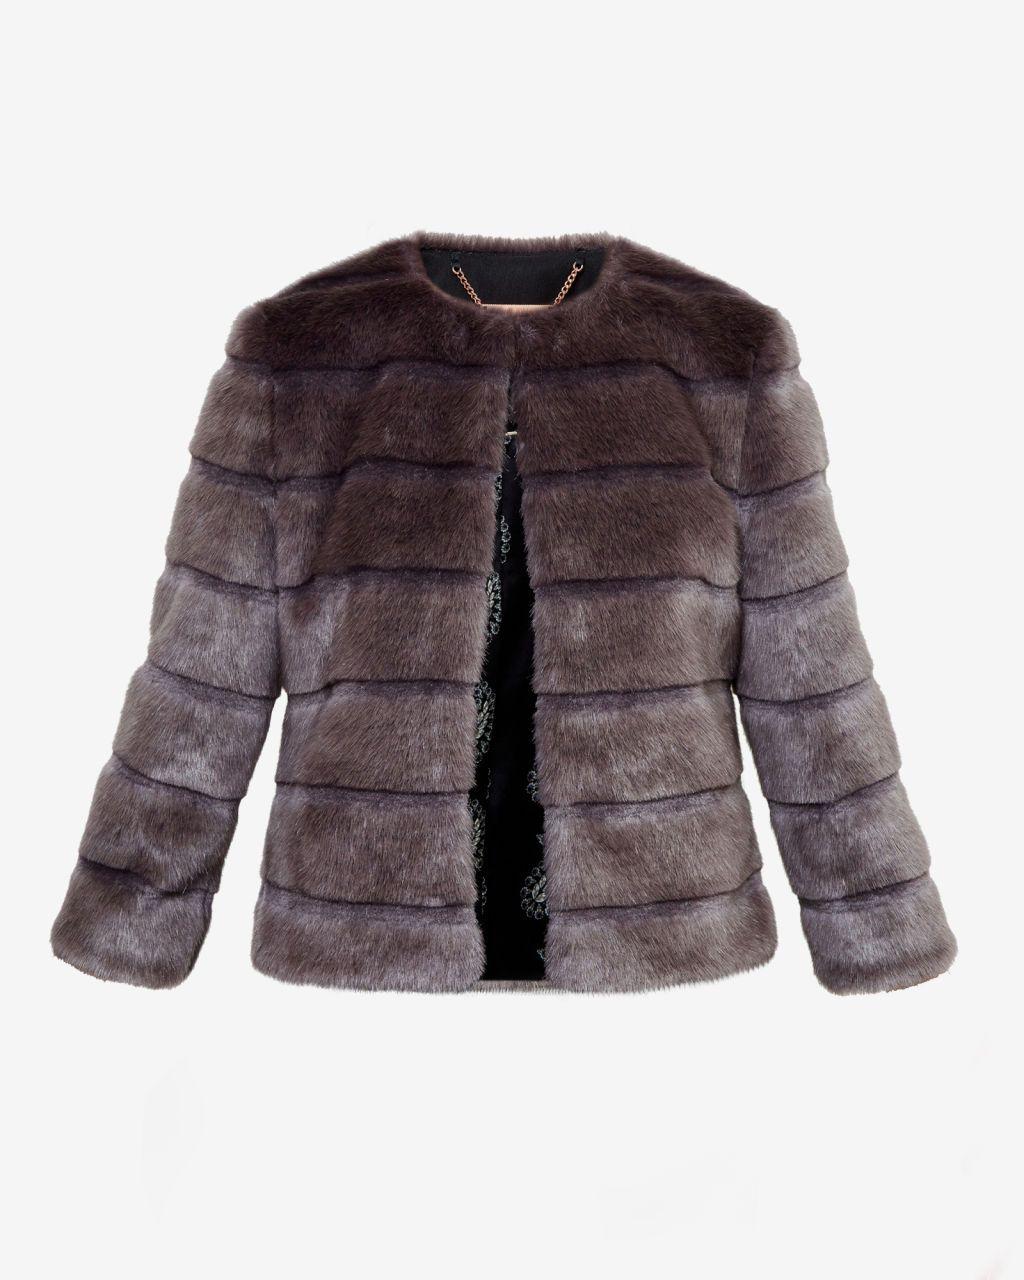 Pin By Charity Hall On Women S Style Faux Fur Cropped Jacket Faux Fur Jacket Purple Jacket [ 1280 x 1024 Pixel ]